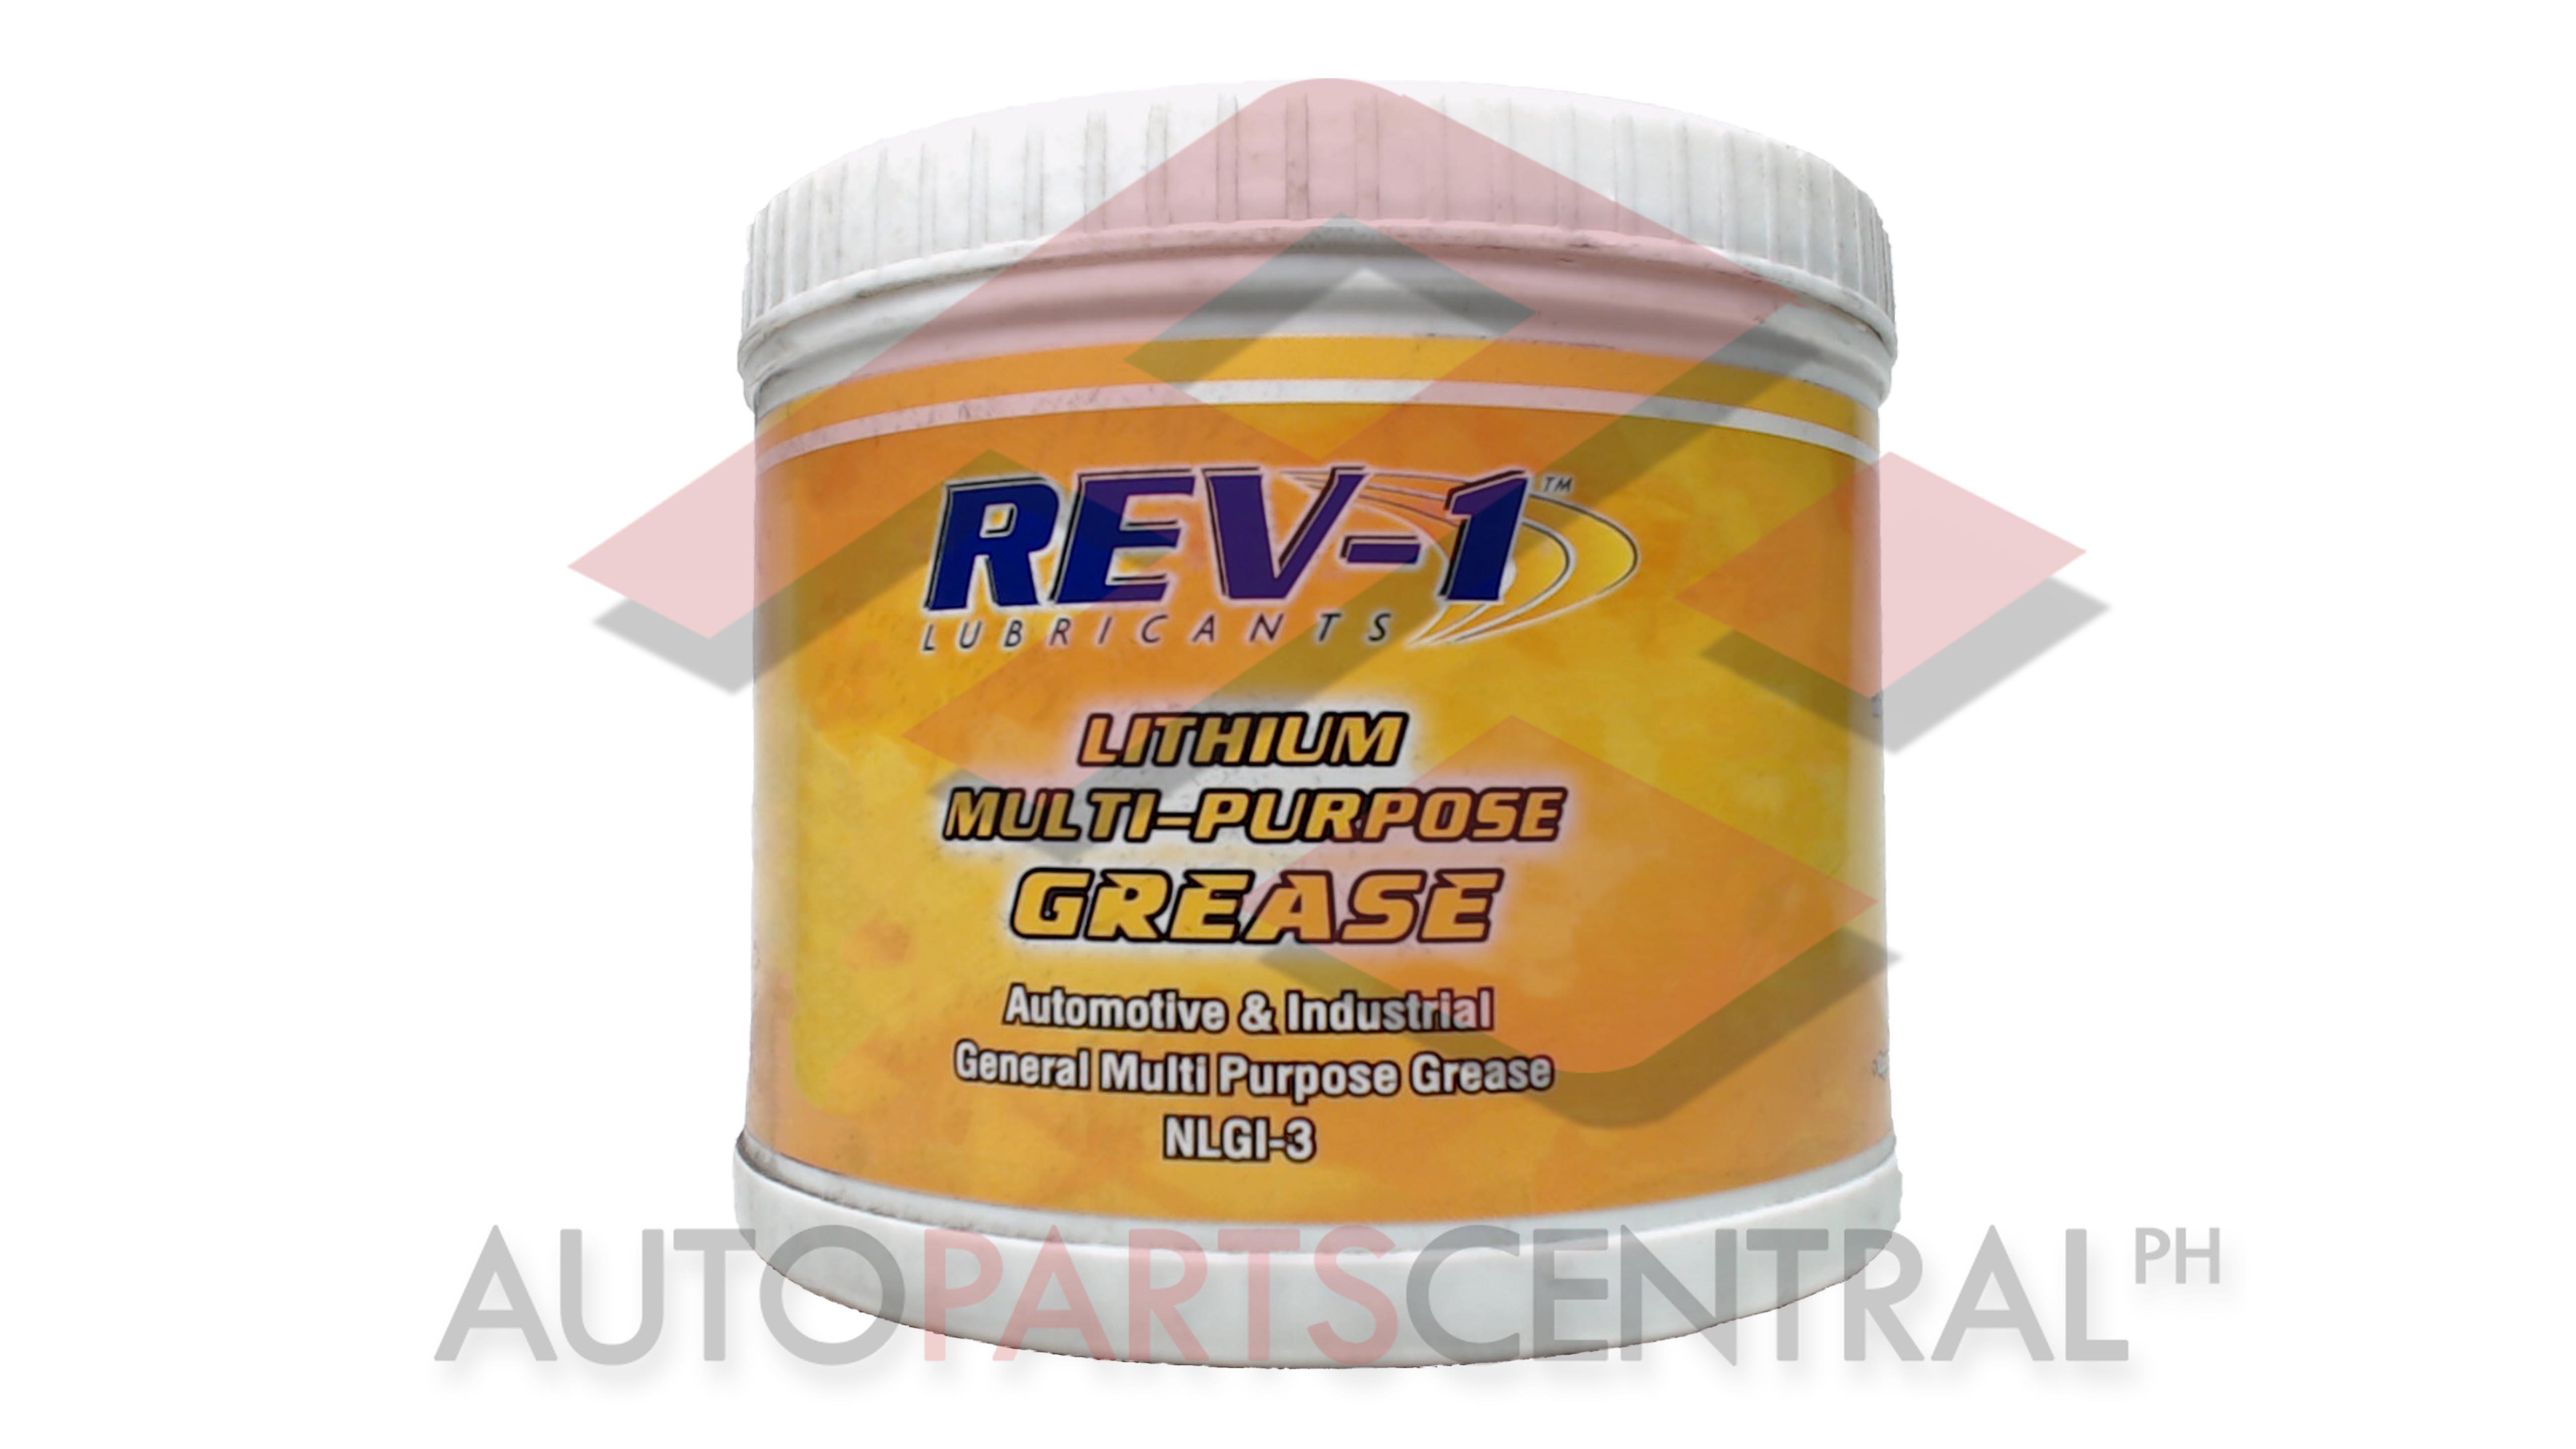 Rev-1 Lubricants Lithium Multi-Purpose Grease NLG1-3 1kg